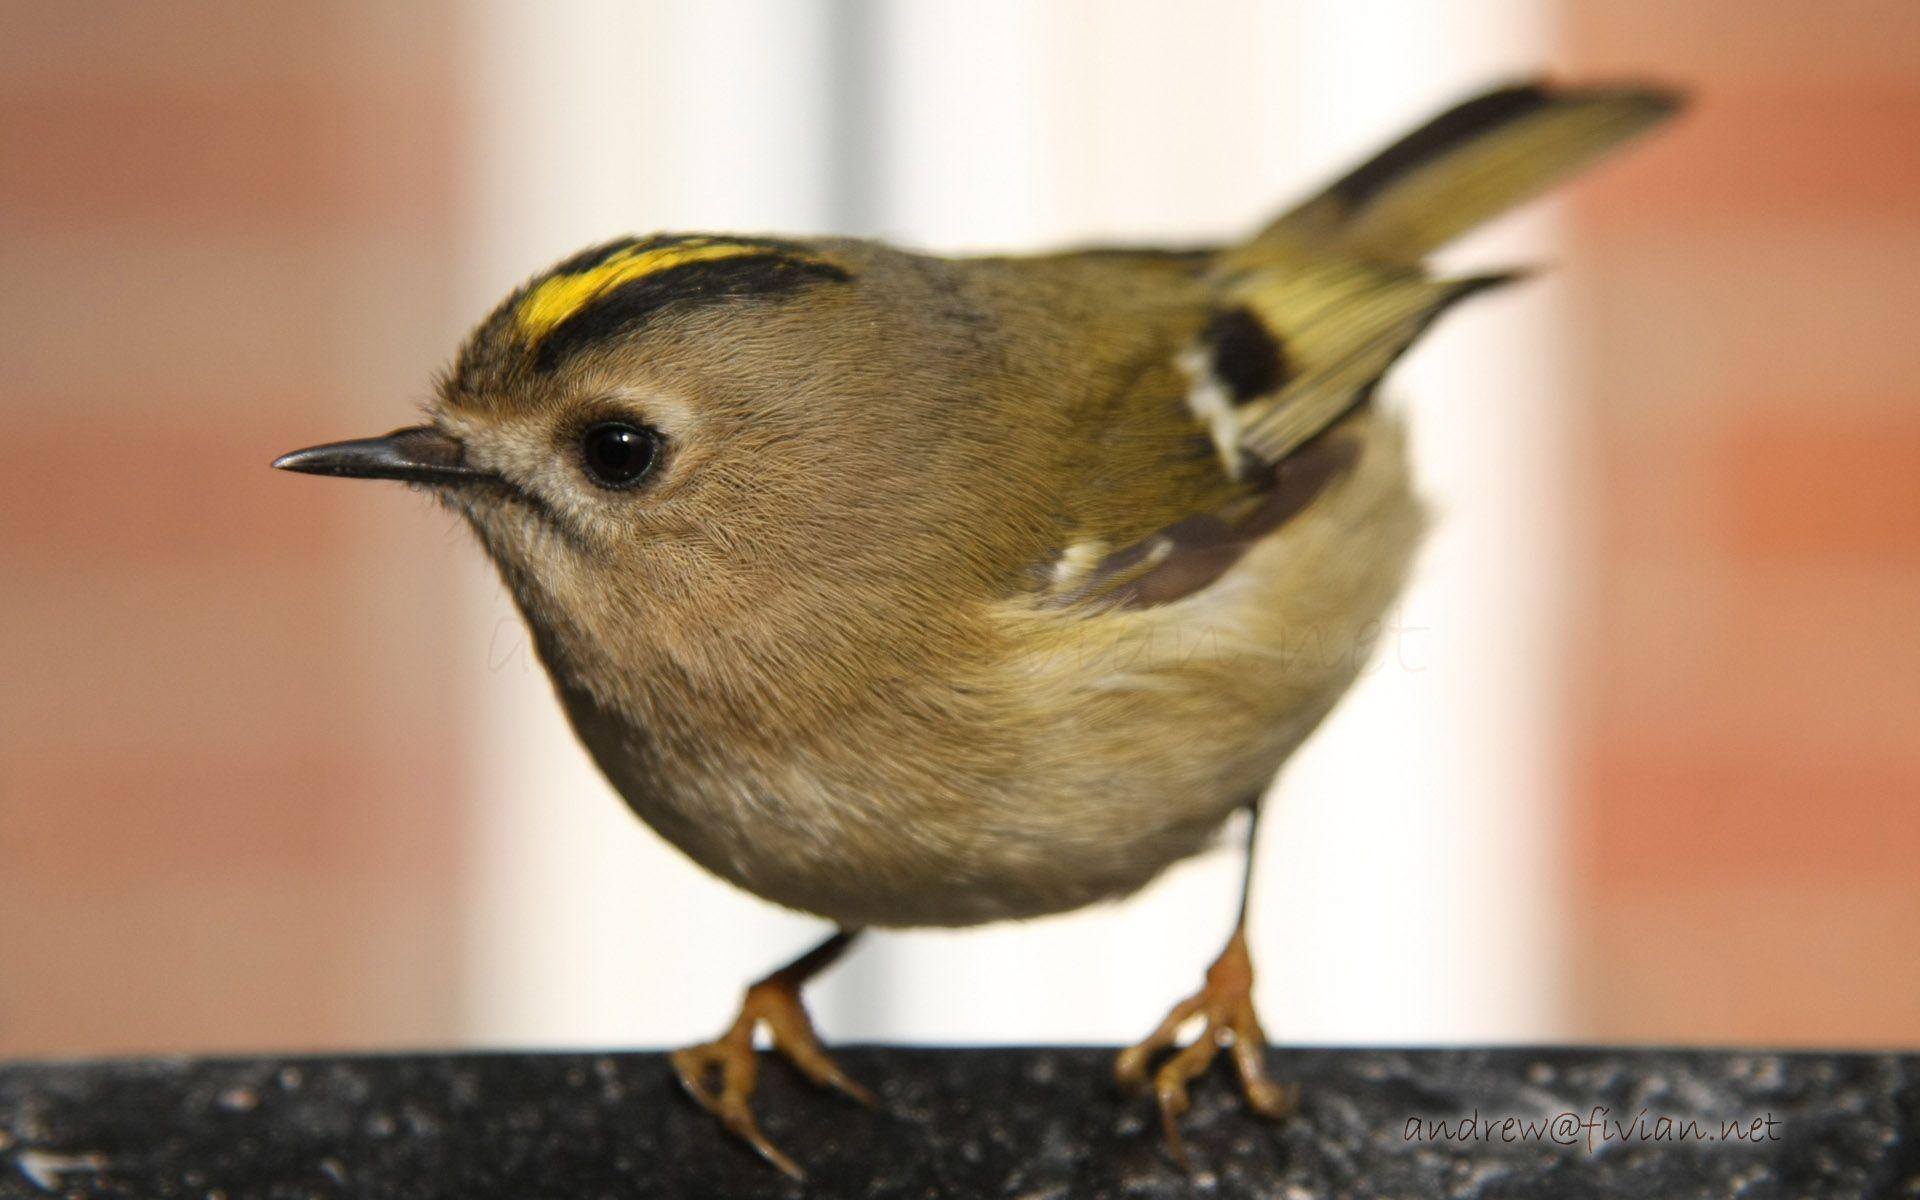 pin by jayne lm on garden nurture nature birds small. Black Bedroom Furniture Sets. Home Design Ideas